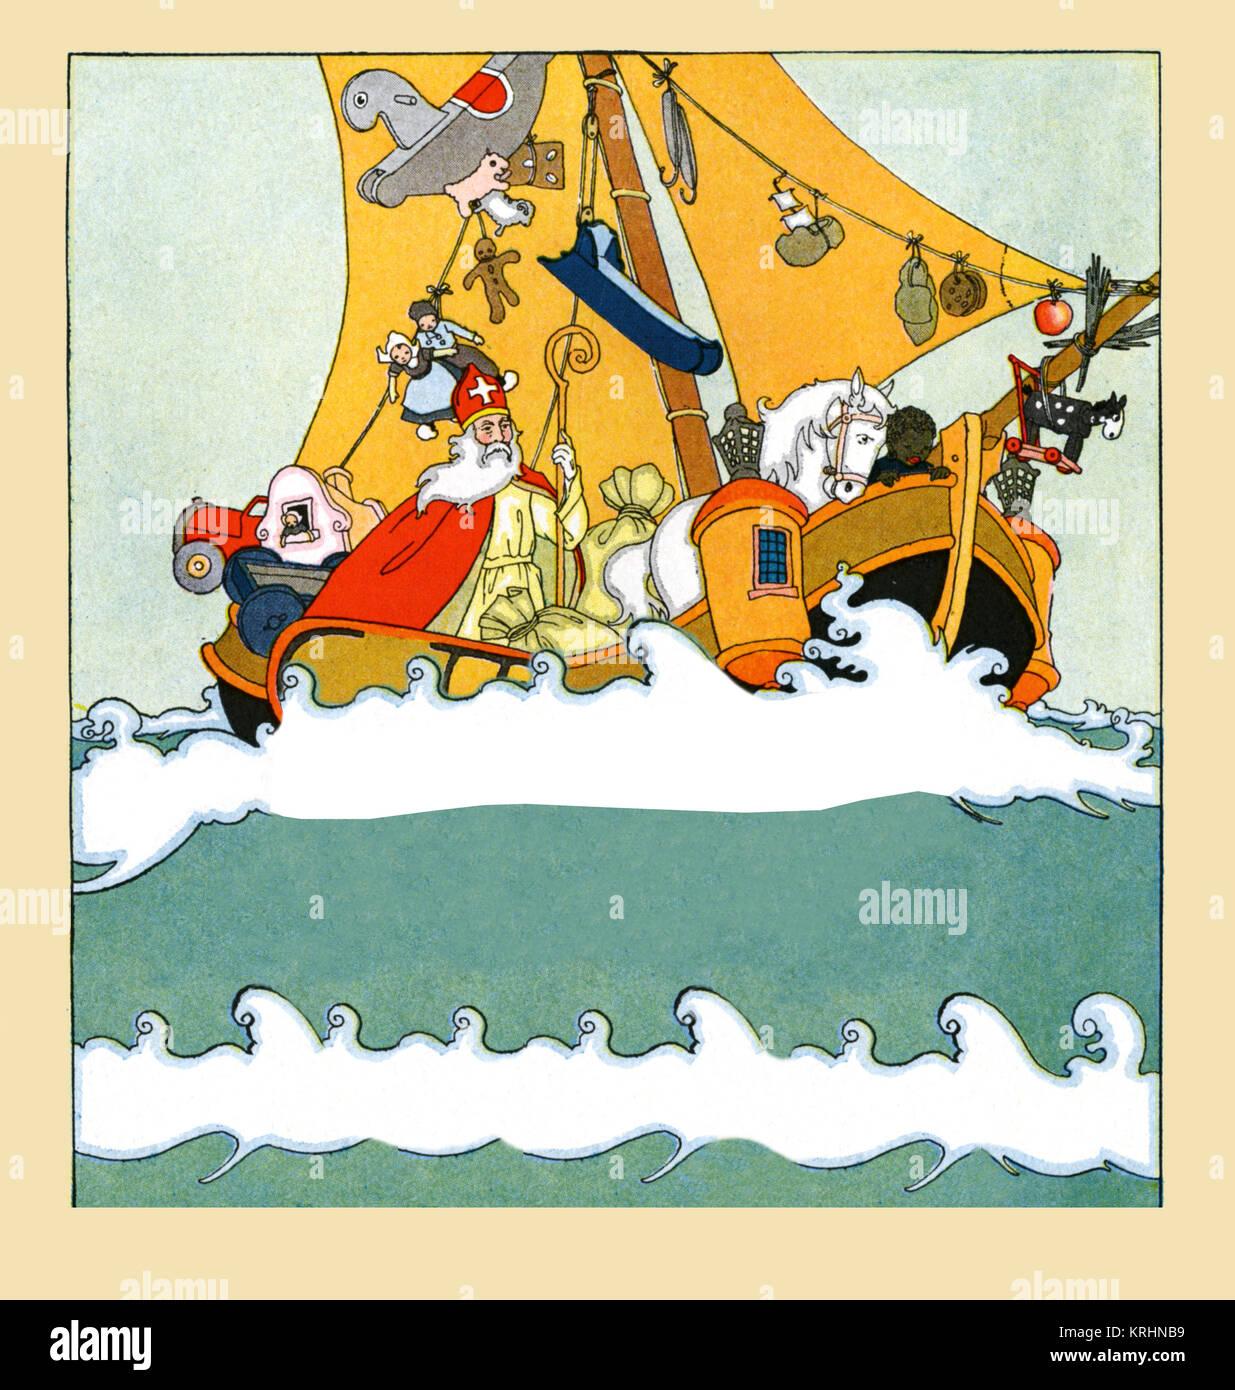 Saint Nicolas' Boat - Stock Image